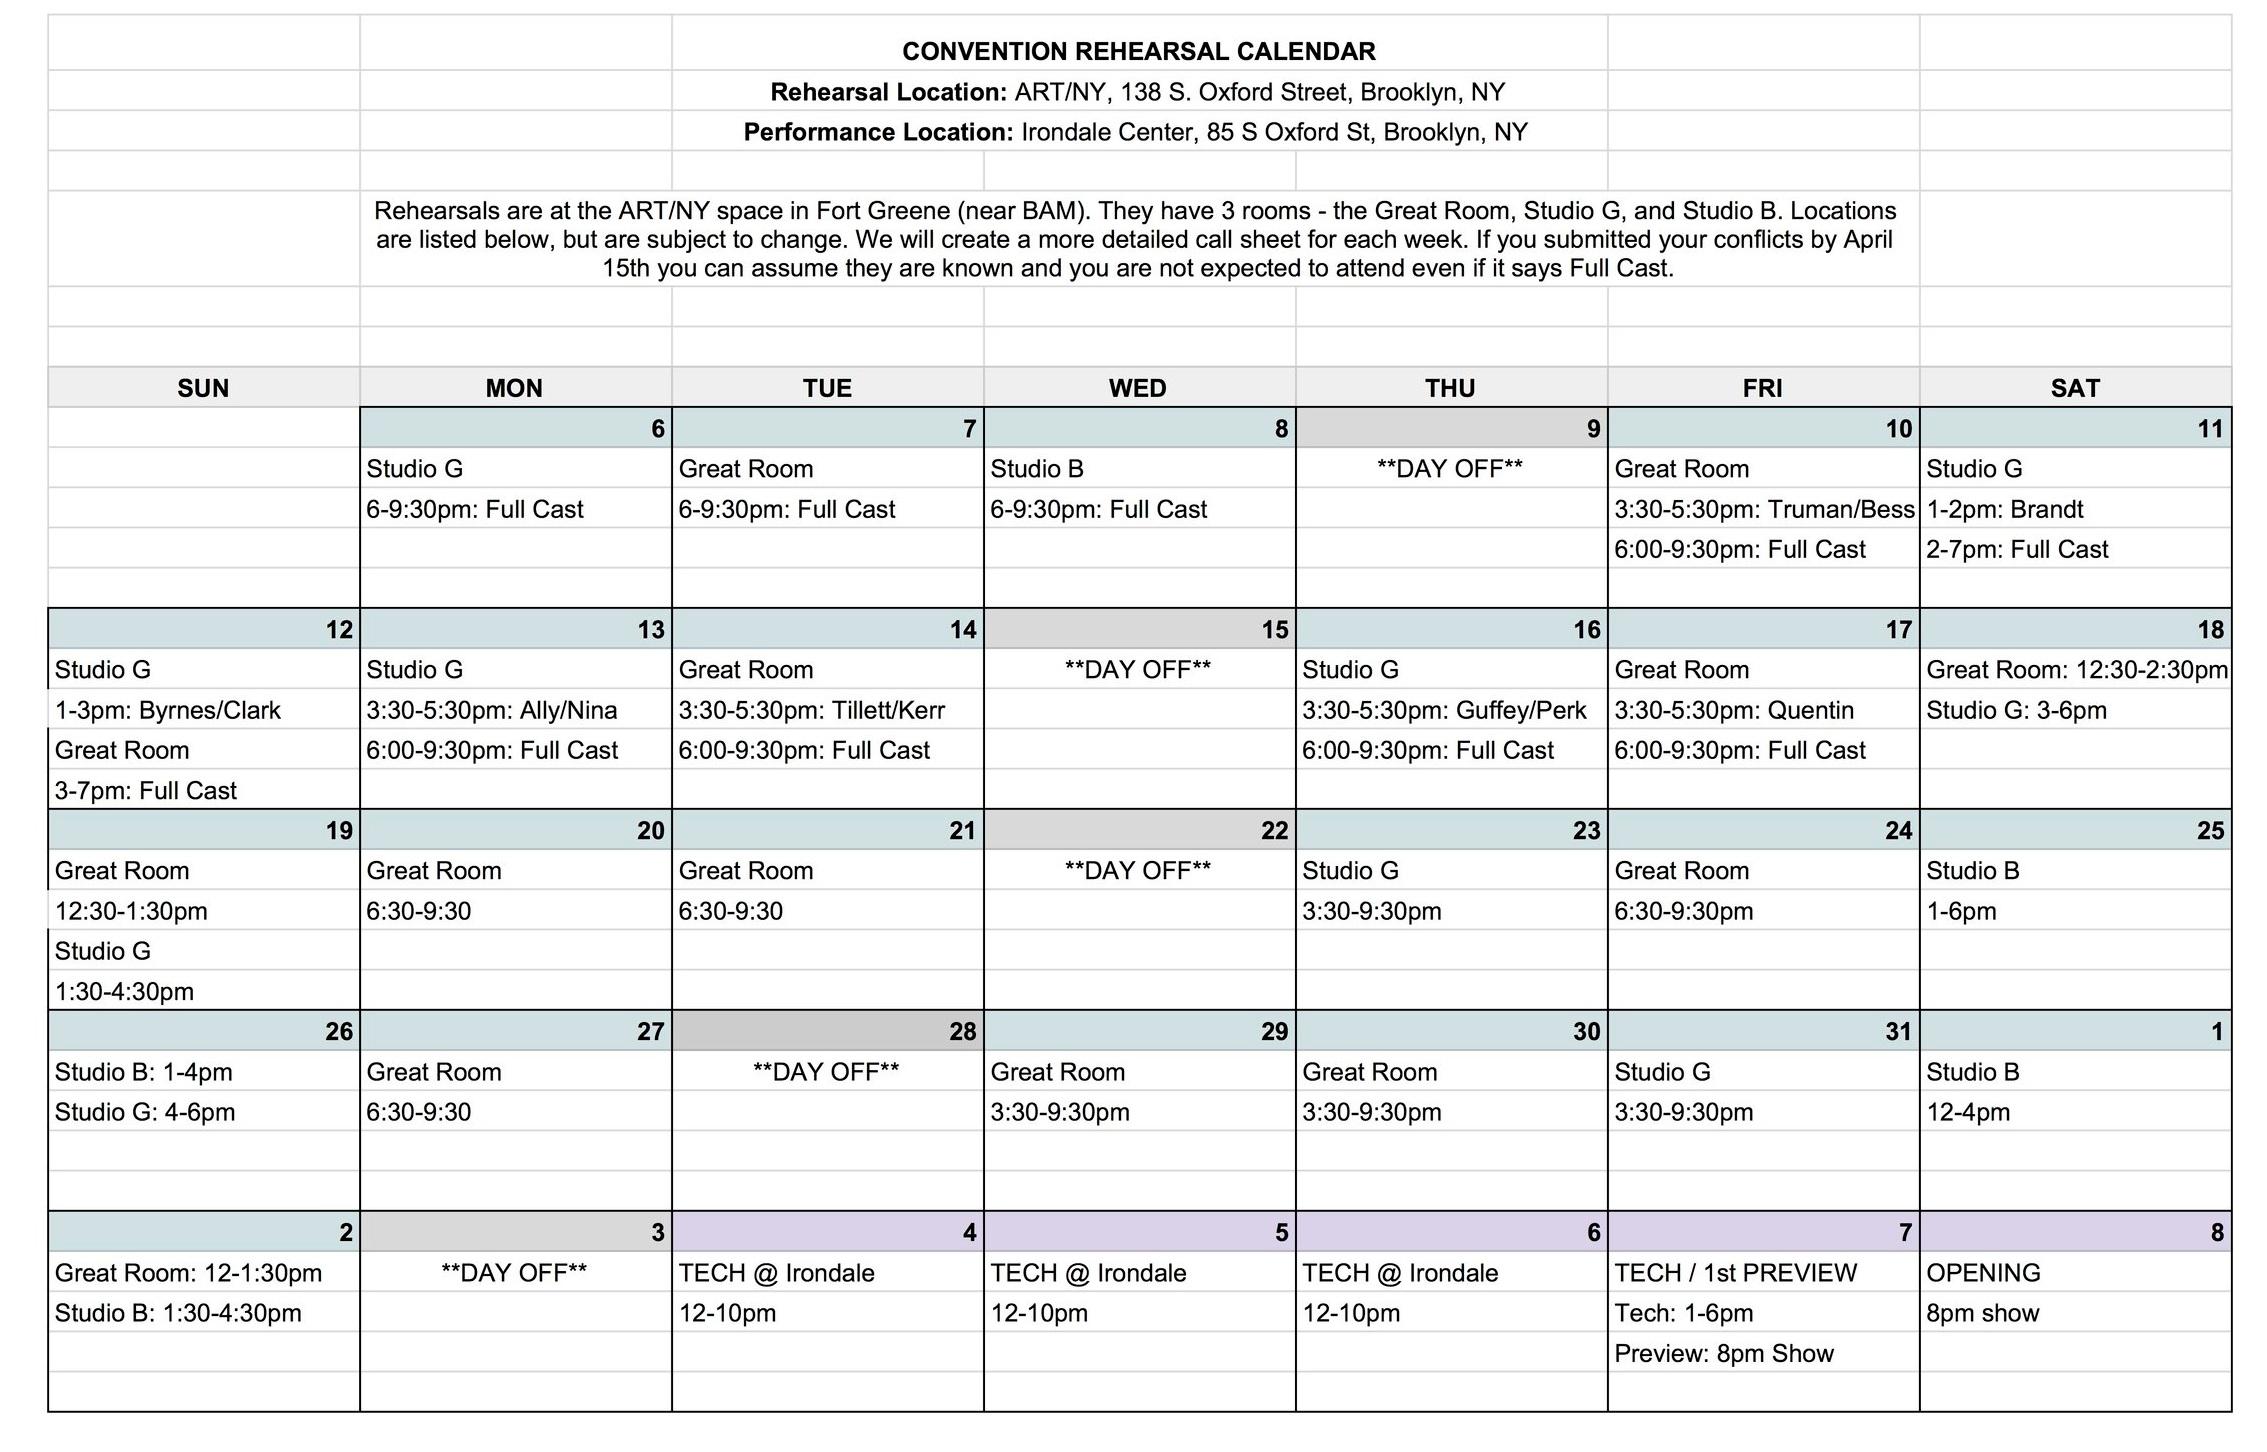 Rehearsal+Schedule+Convention++-+Copy+of+Calendar+copy.jpg